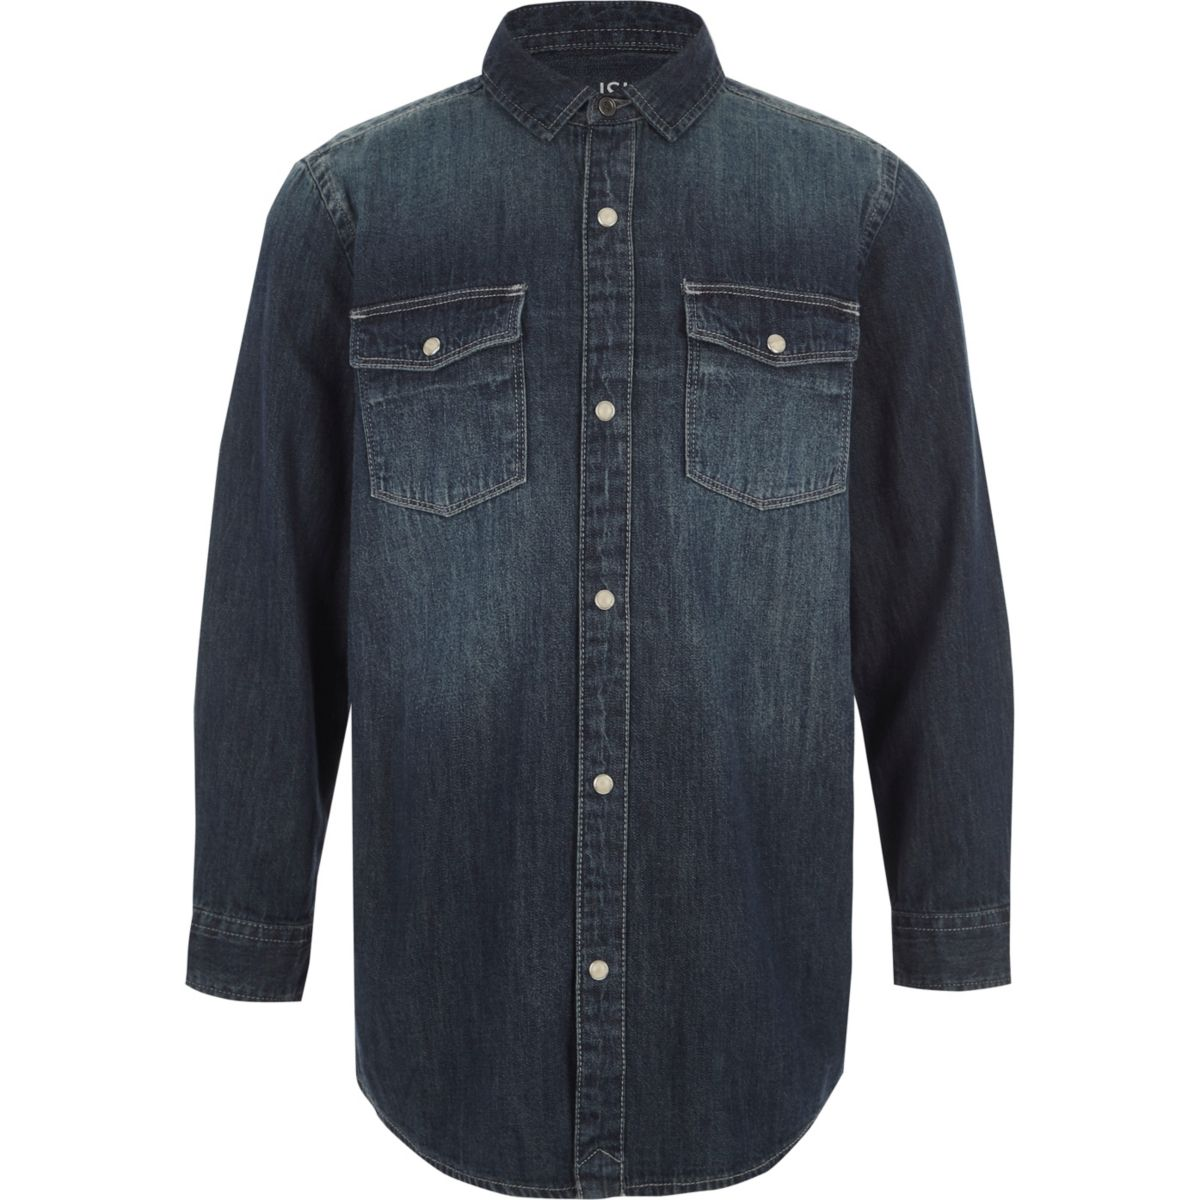 Boys blue long sleeve denim shirt